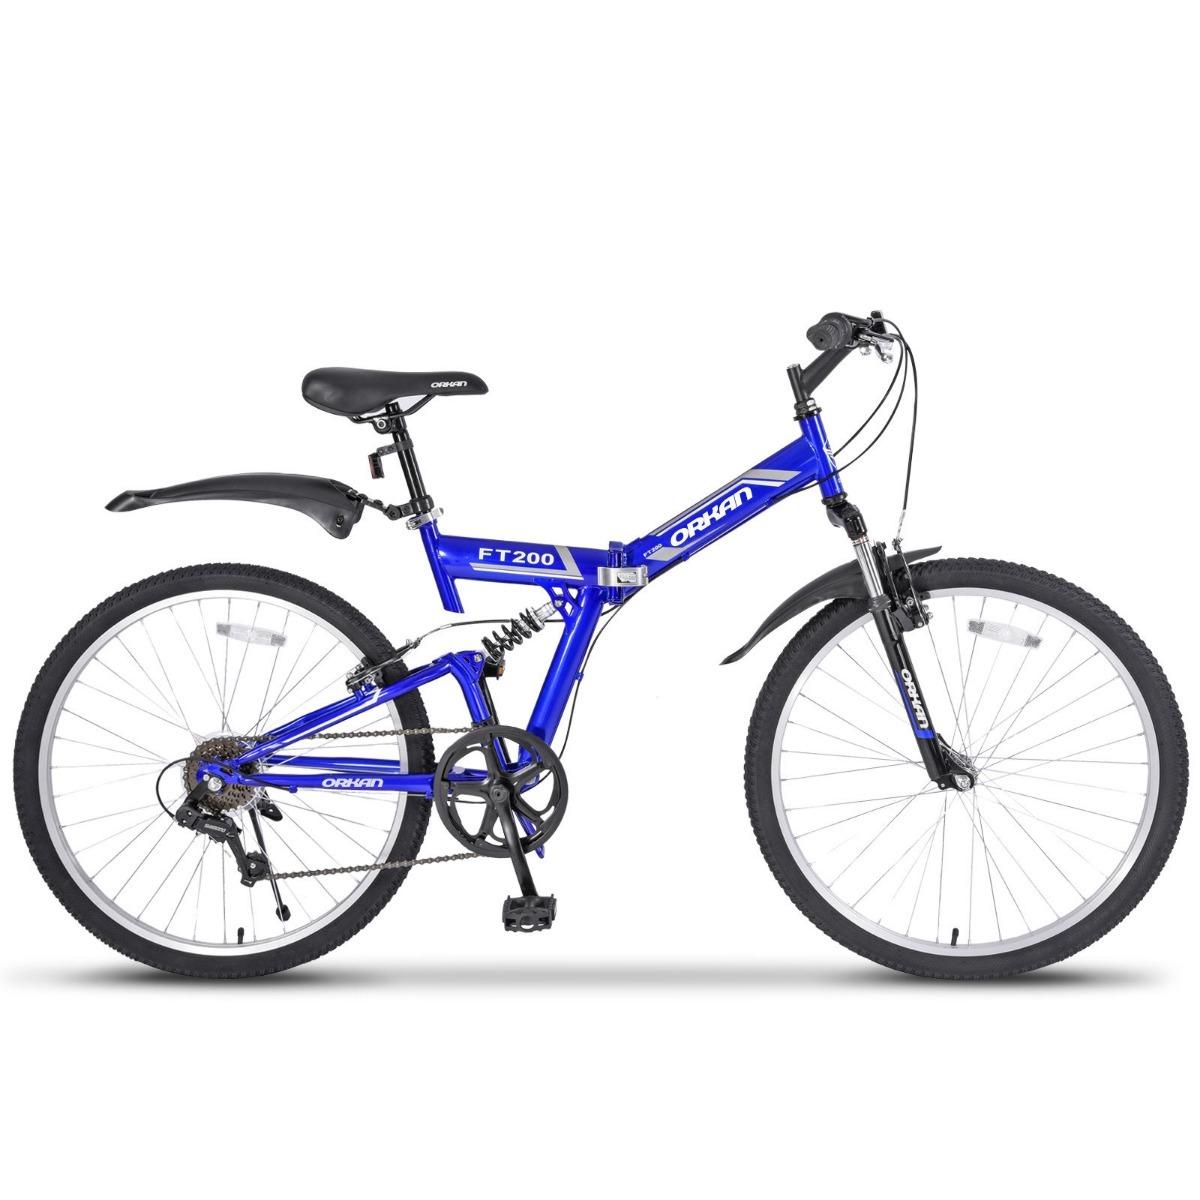 Bicicleta Plegable De Montana R26 7vel Shimano Meses Sin